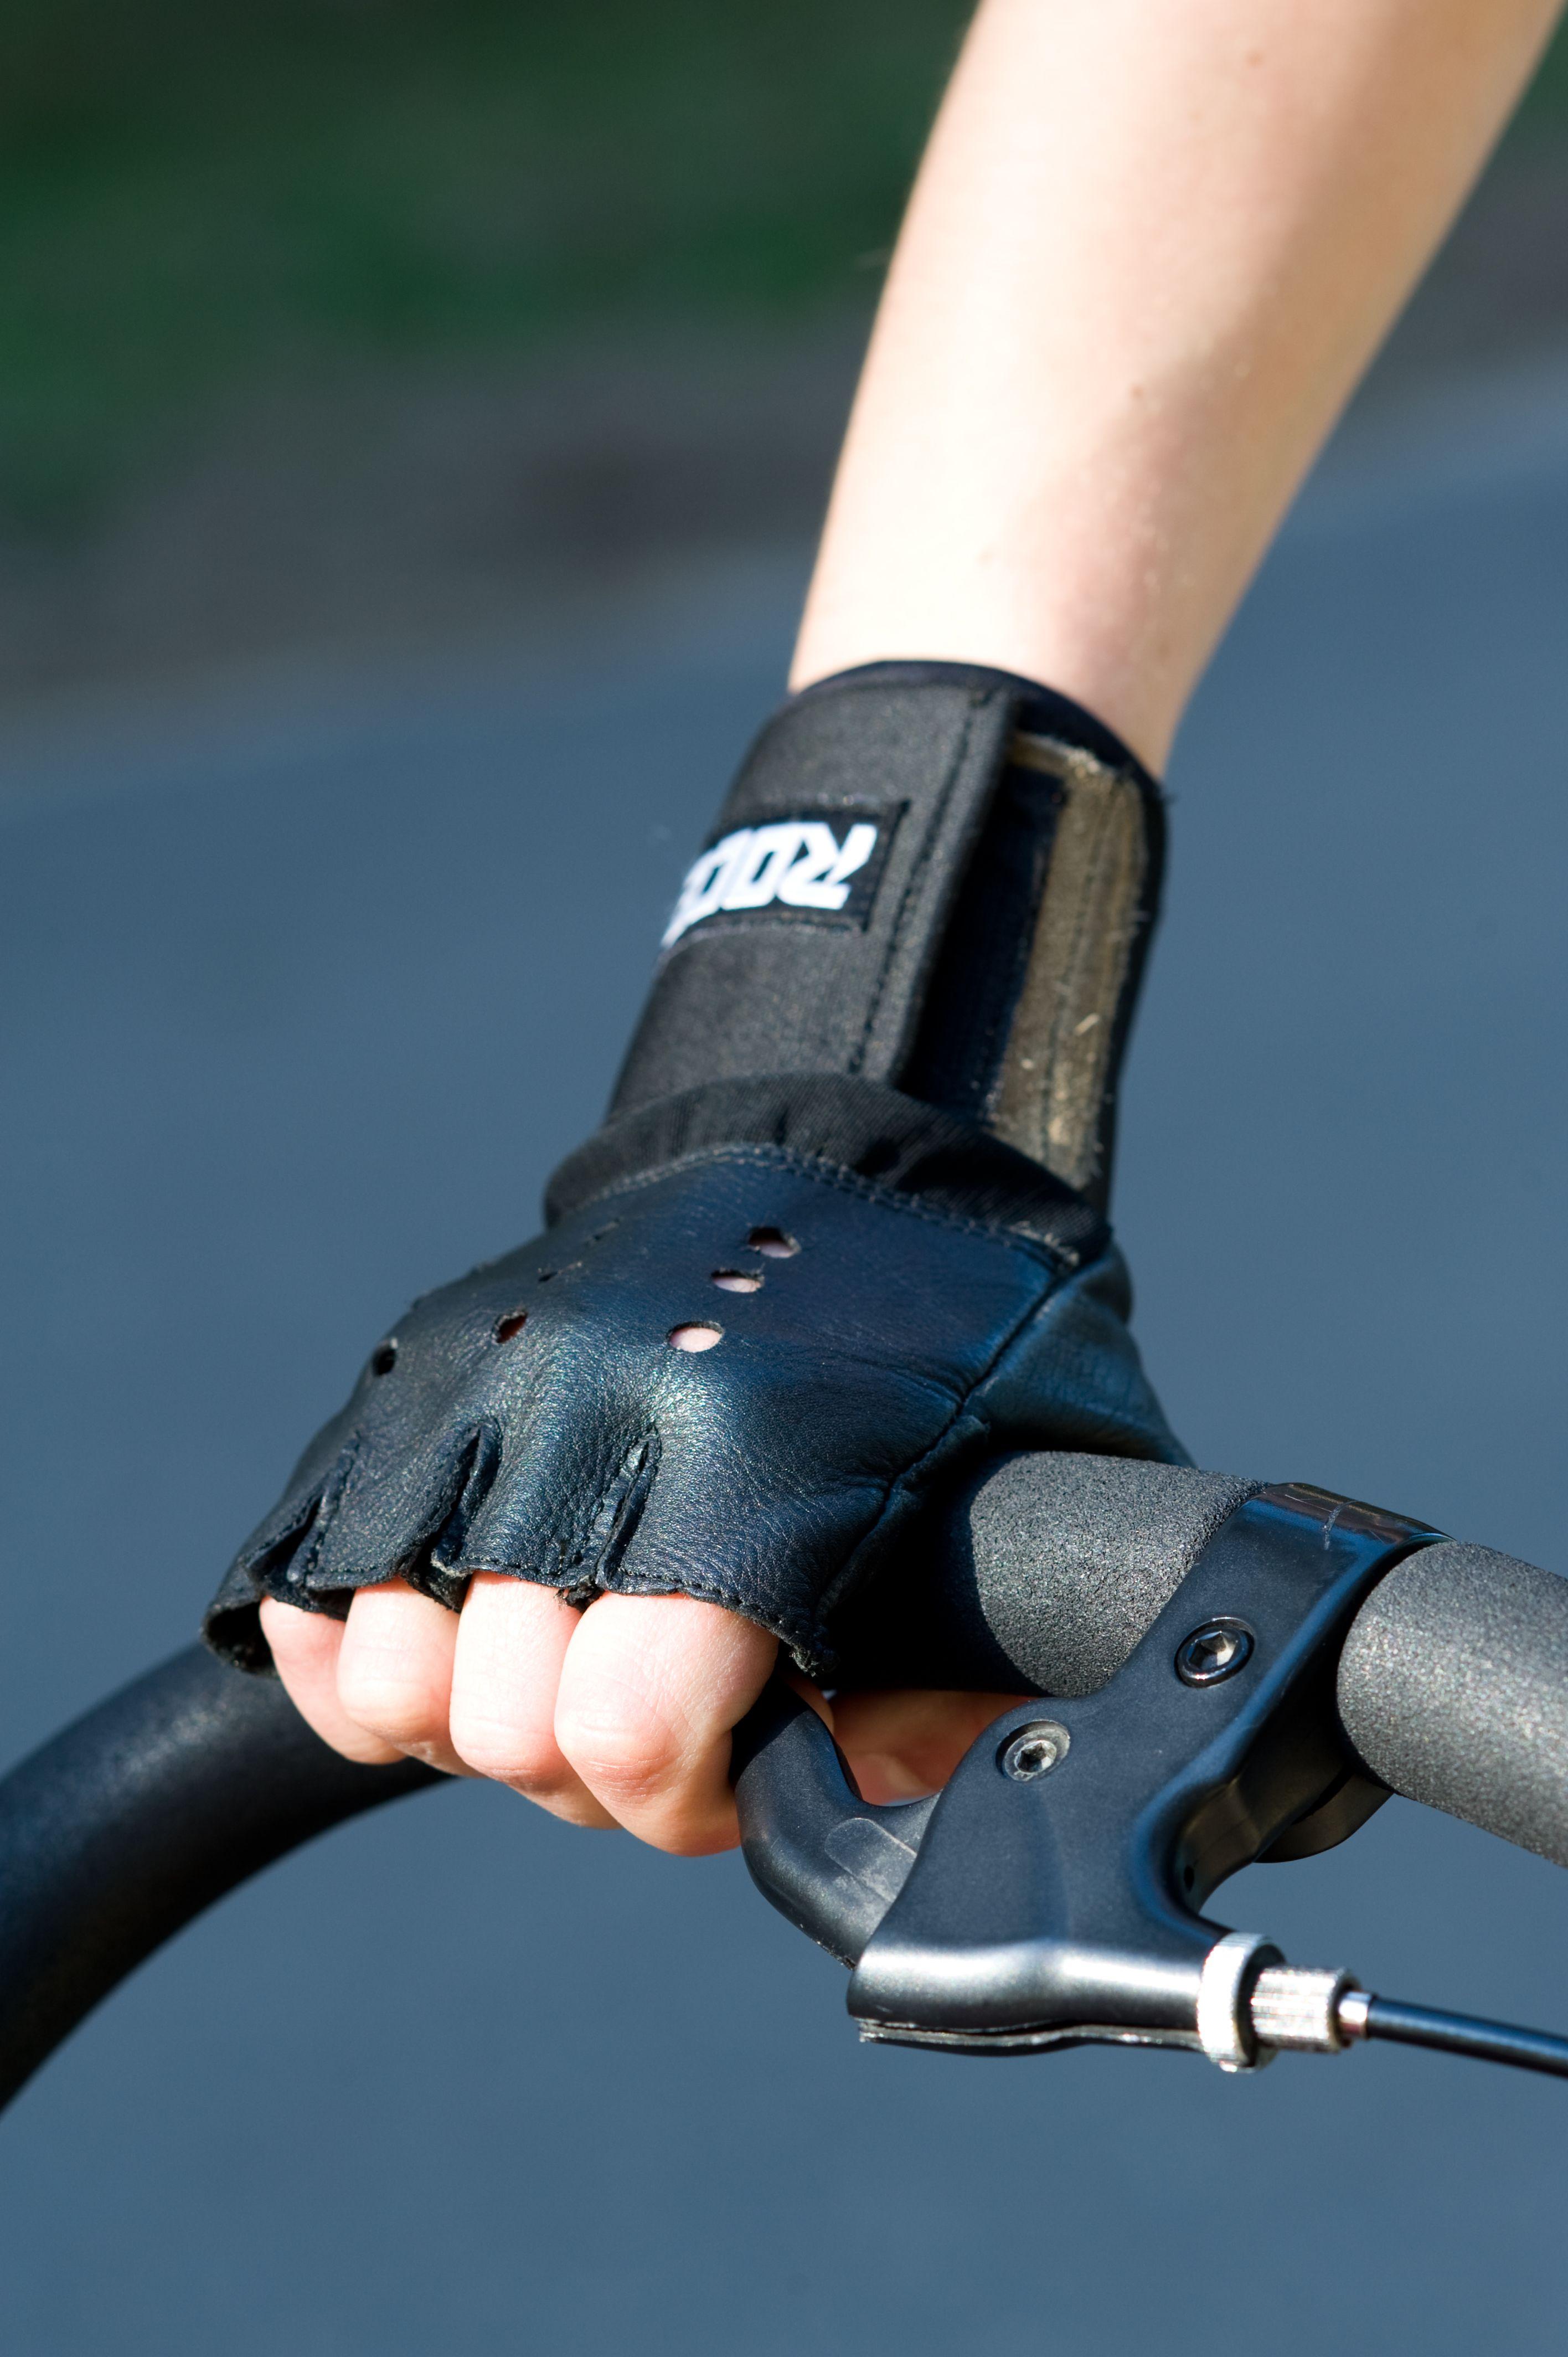 get a handbrake for your stroller - for the safe rollerblading it's